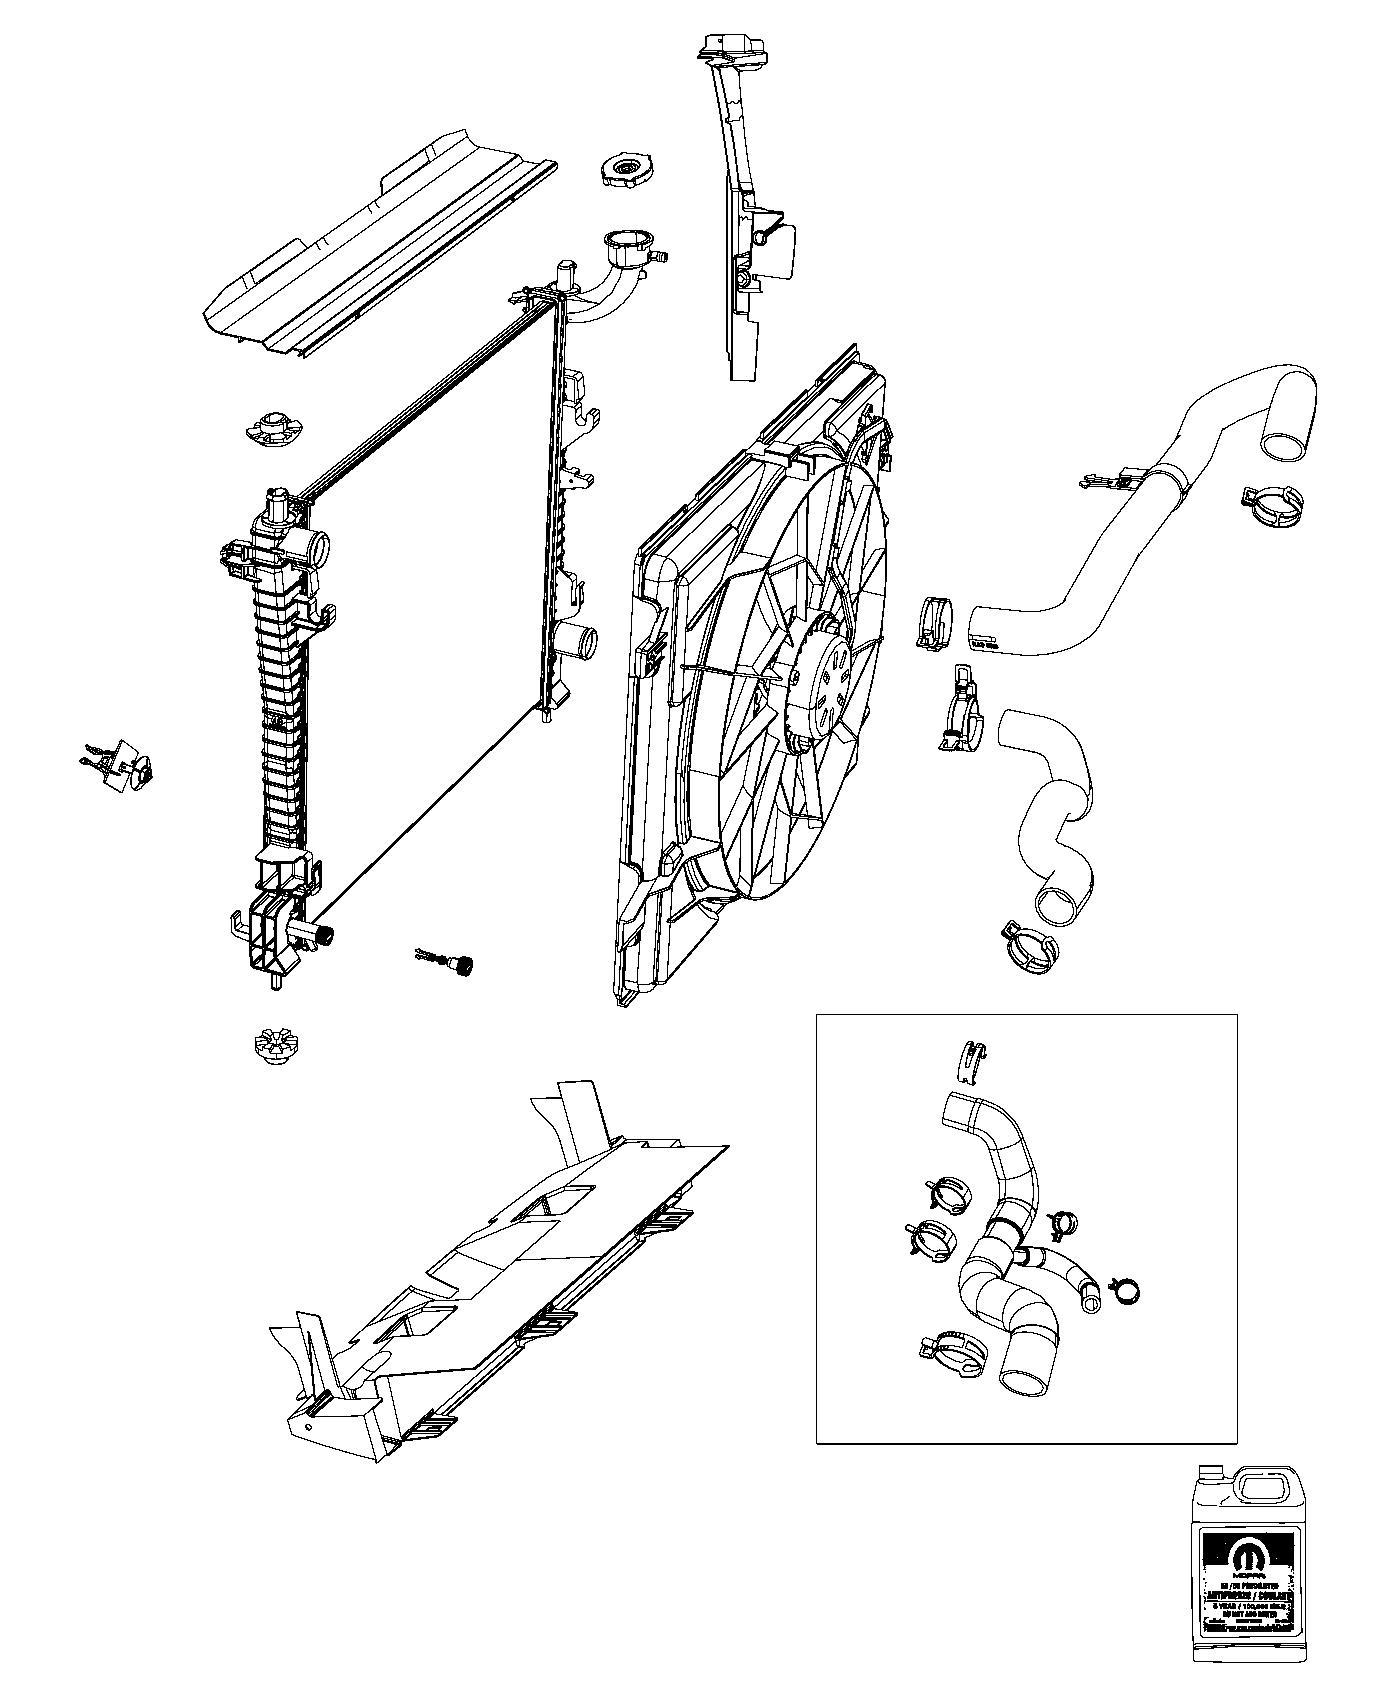 Jeep Wrangler Schematics